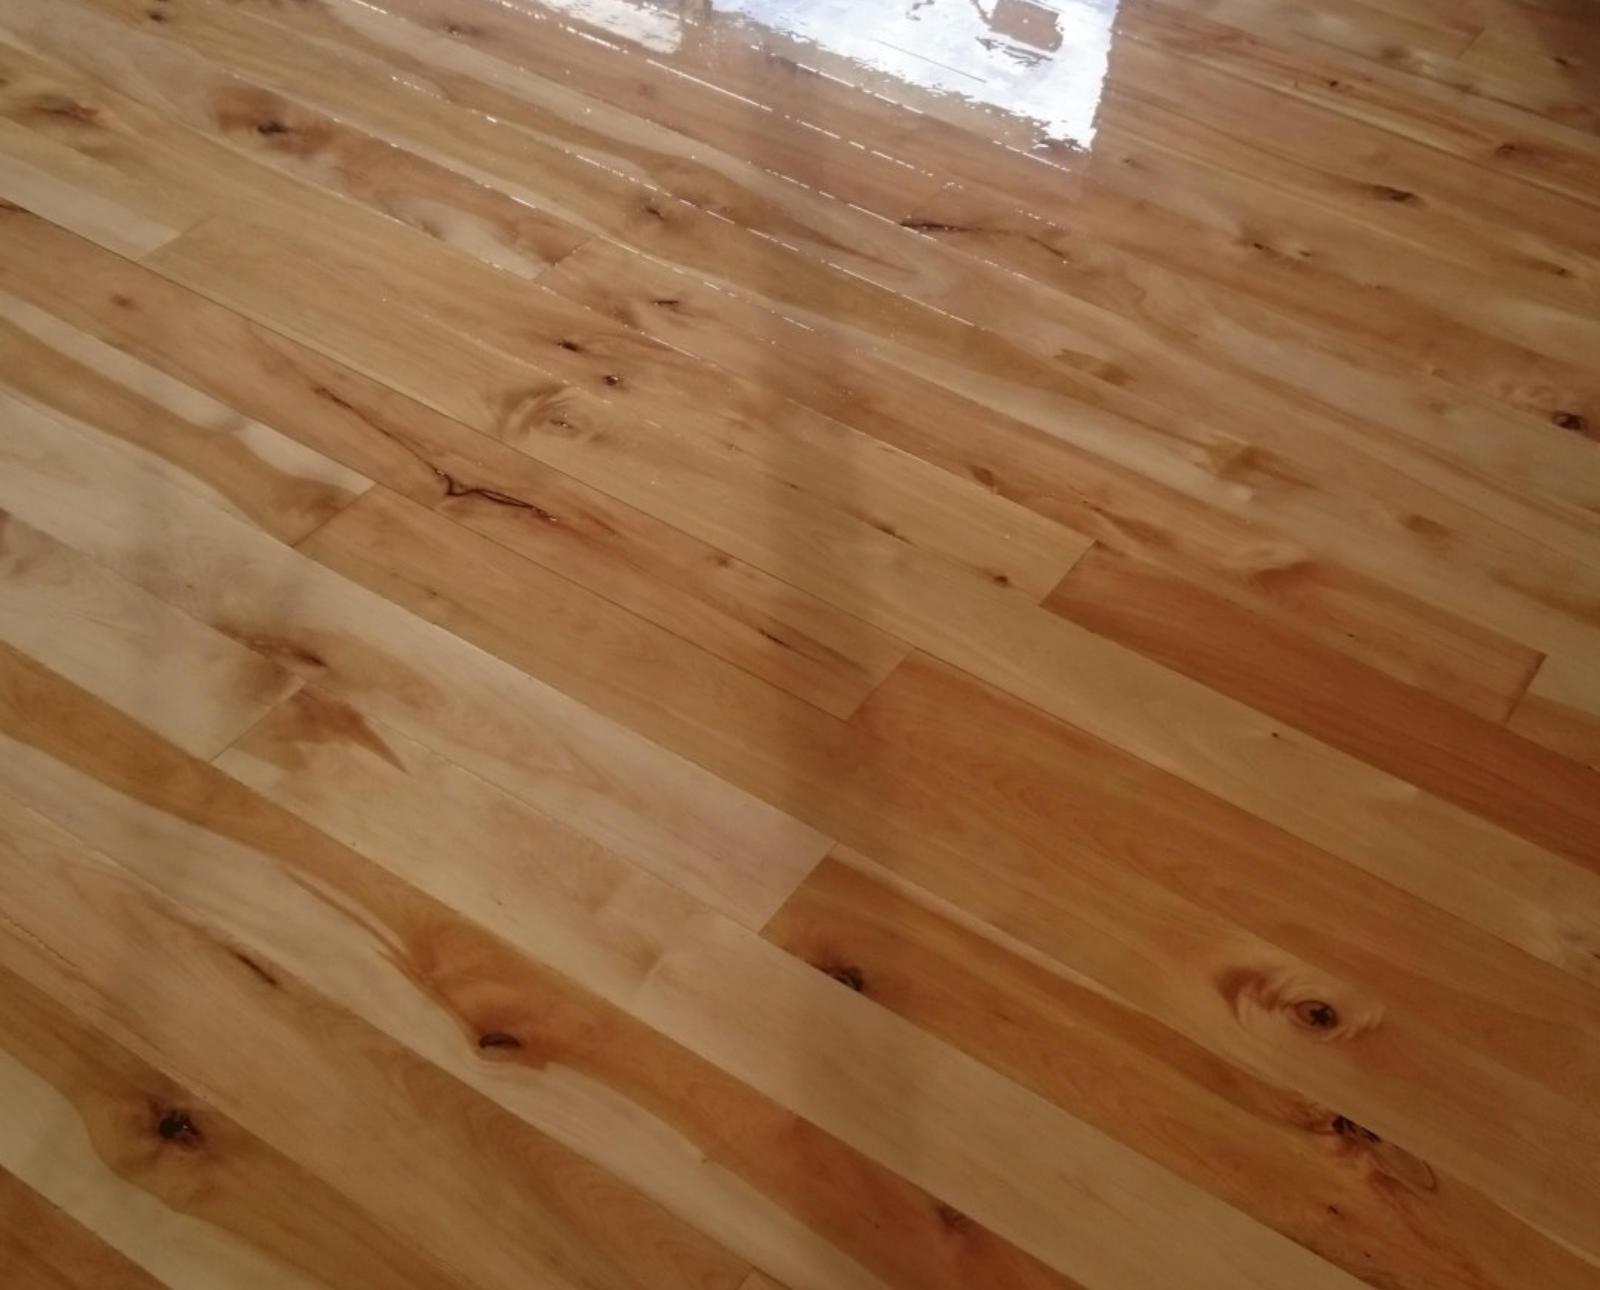 Newly sanded wood floor